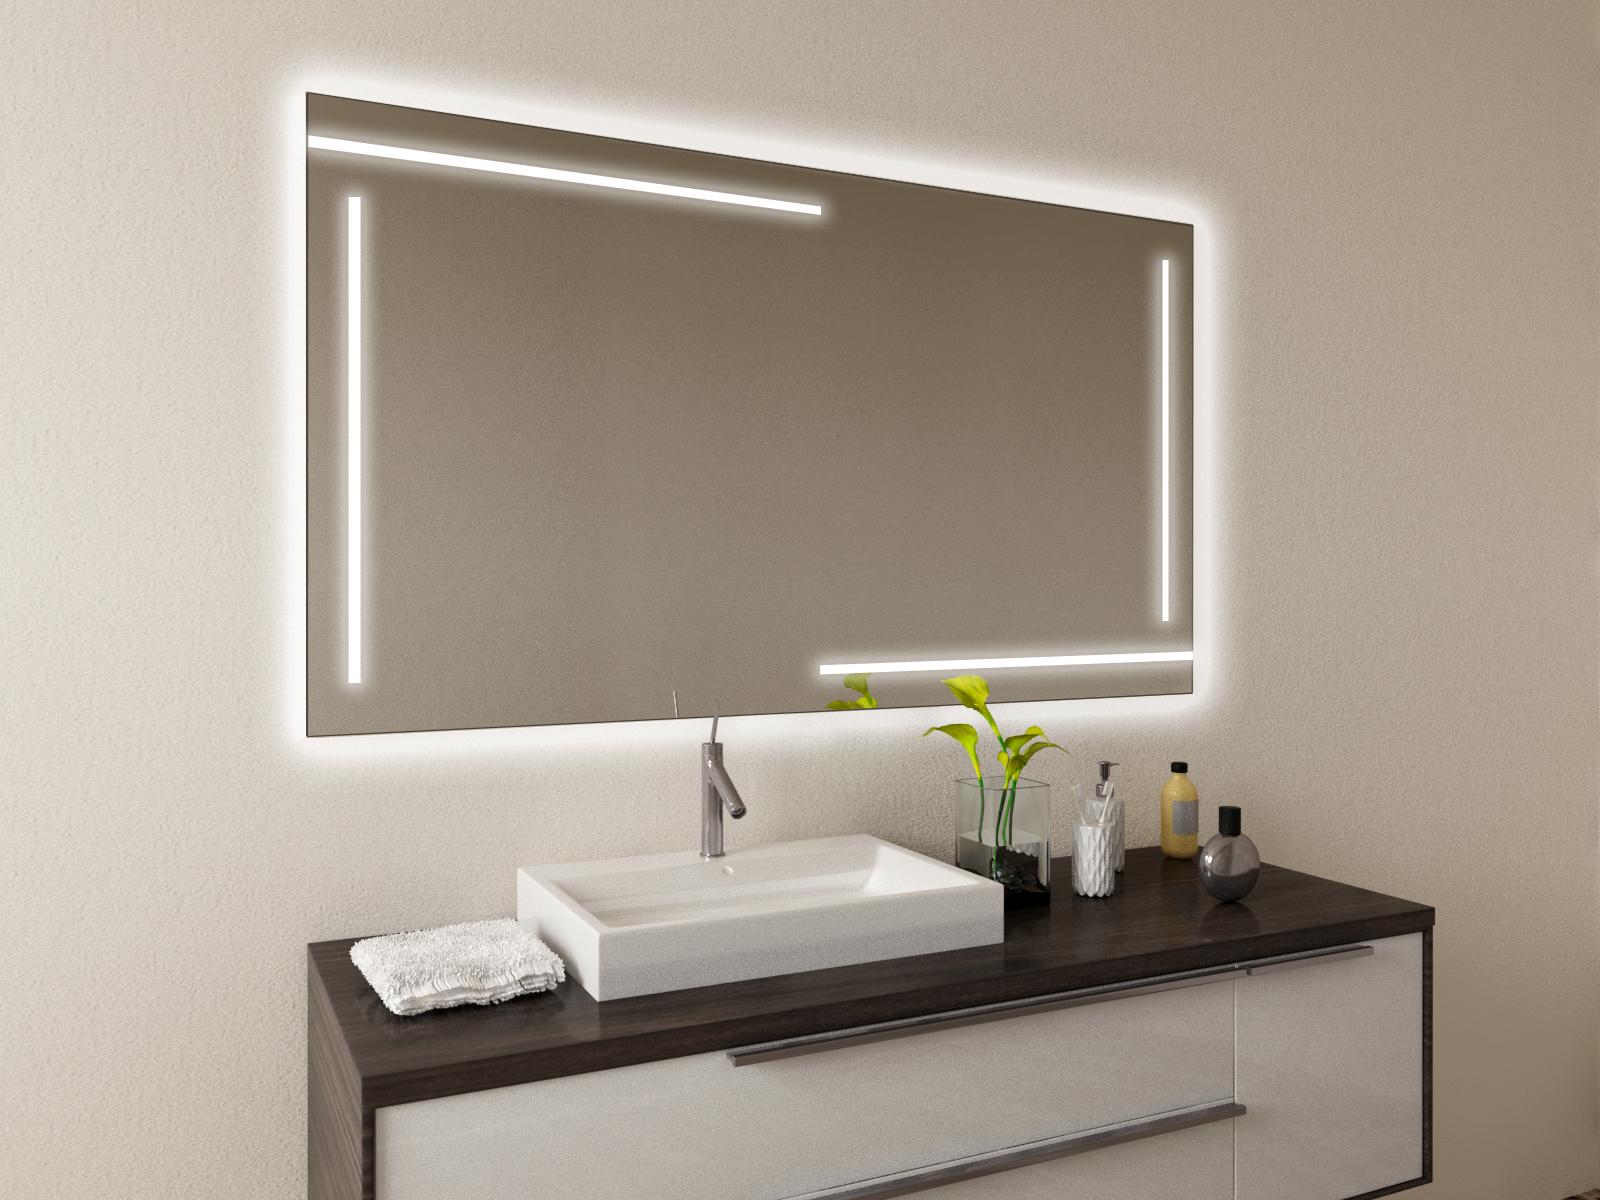 Badspiegel mit LED Beleuchtung - Hildis